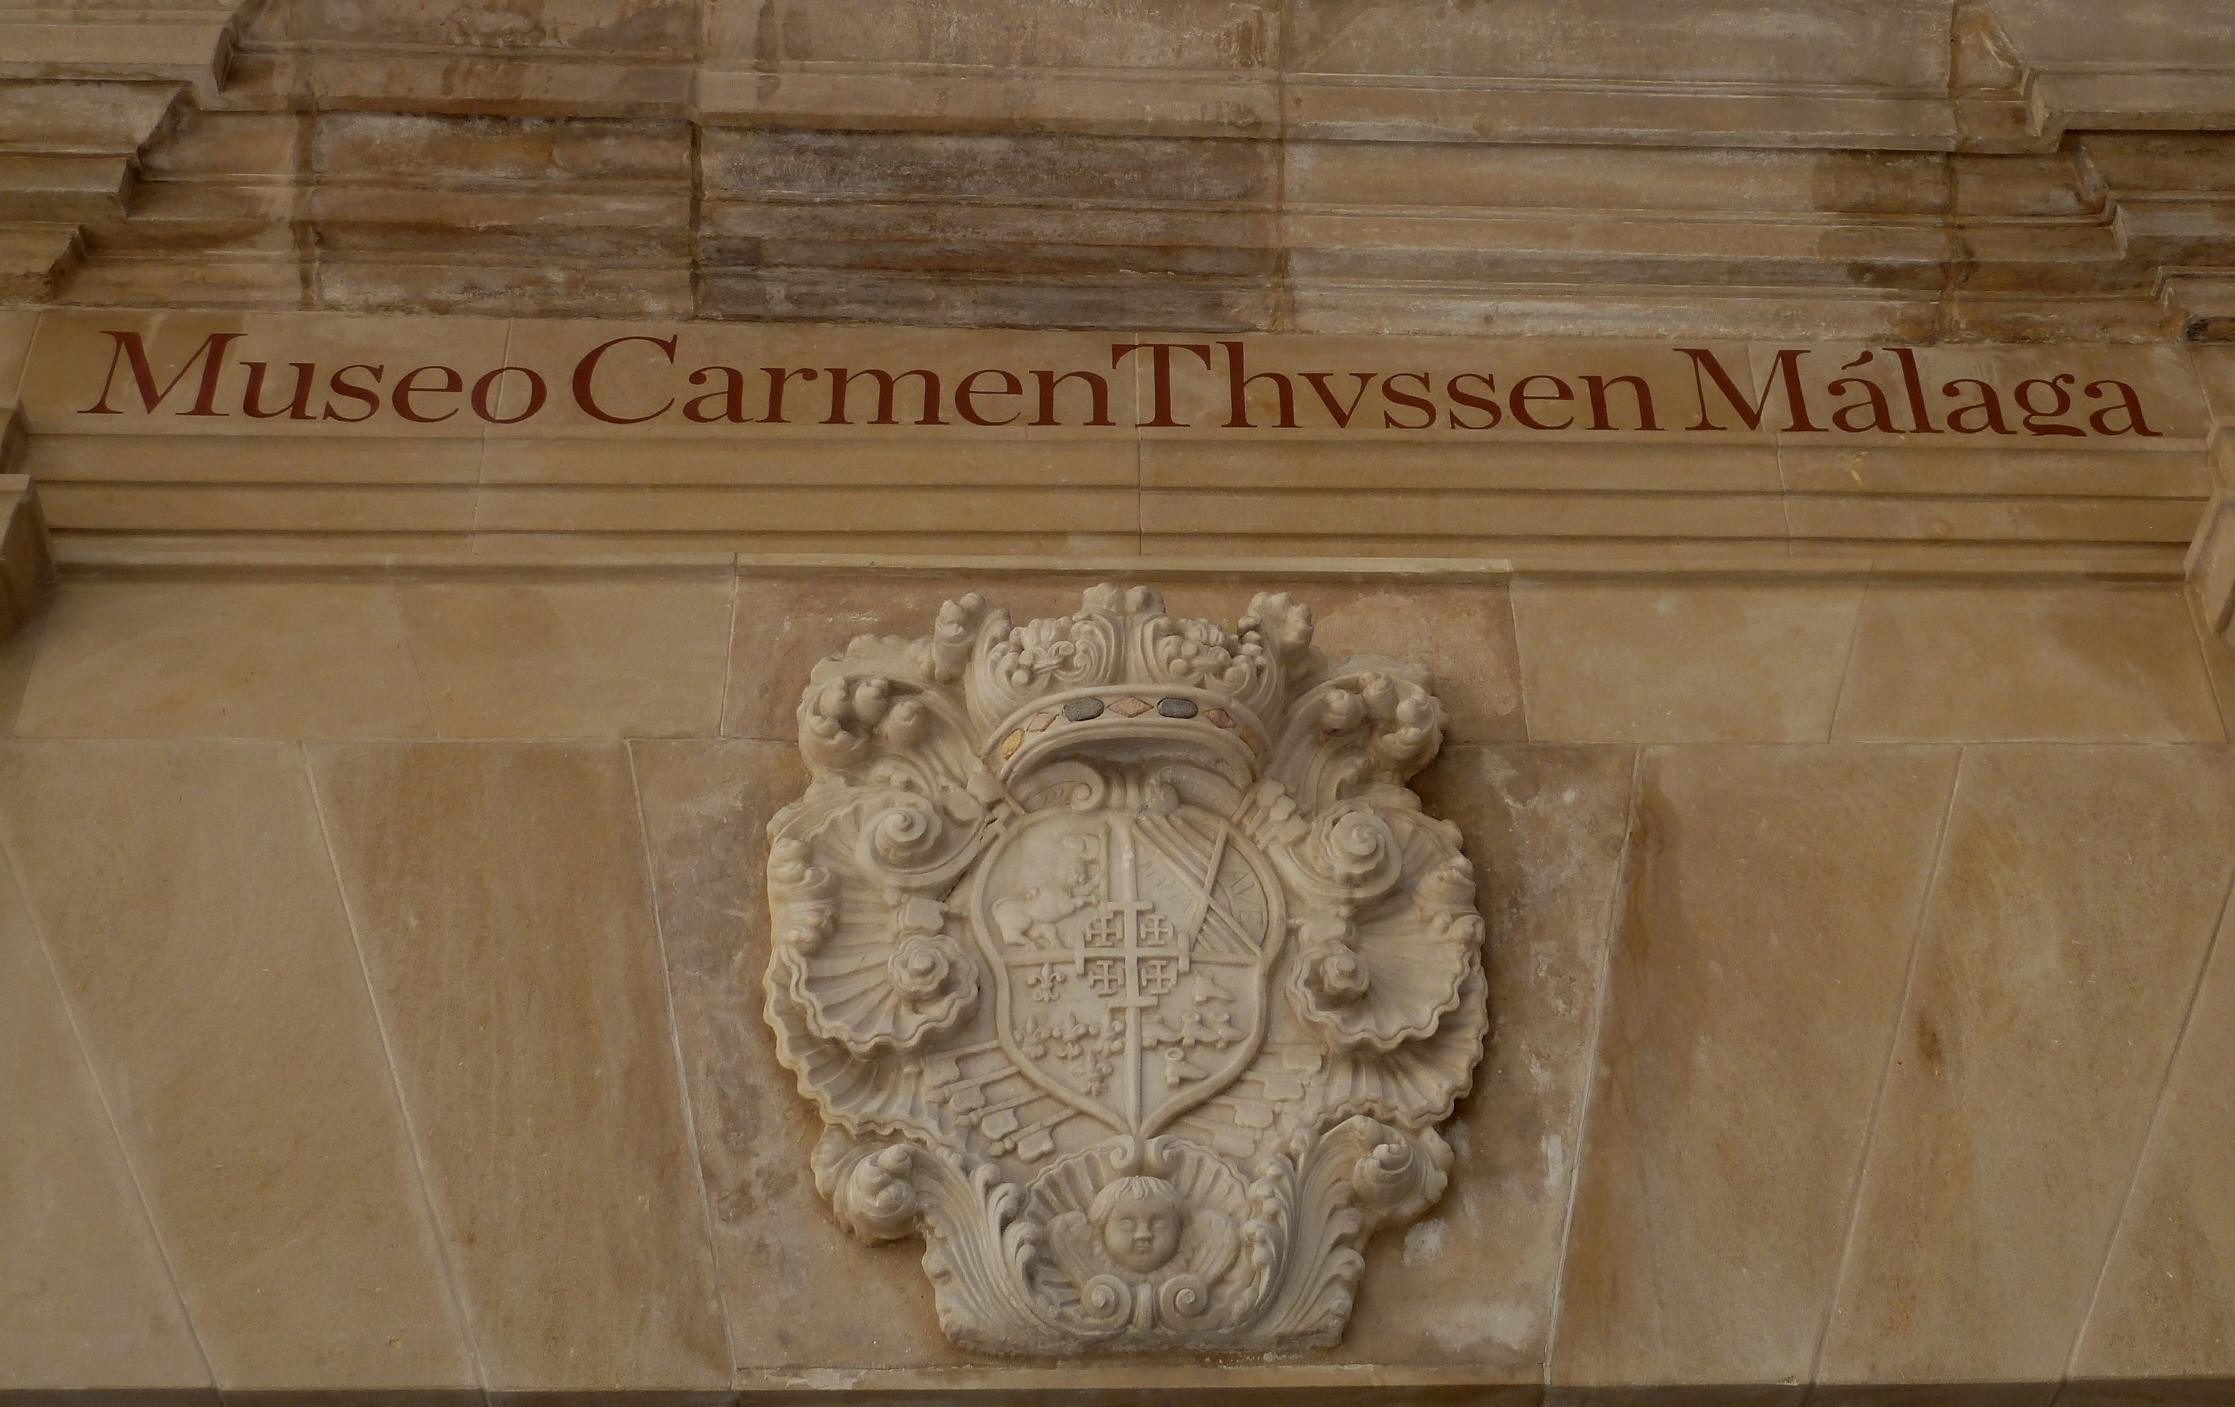 MuseoCarmenThyssen_Malaga_Renaissance_doorway